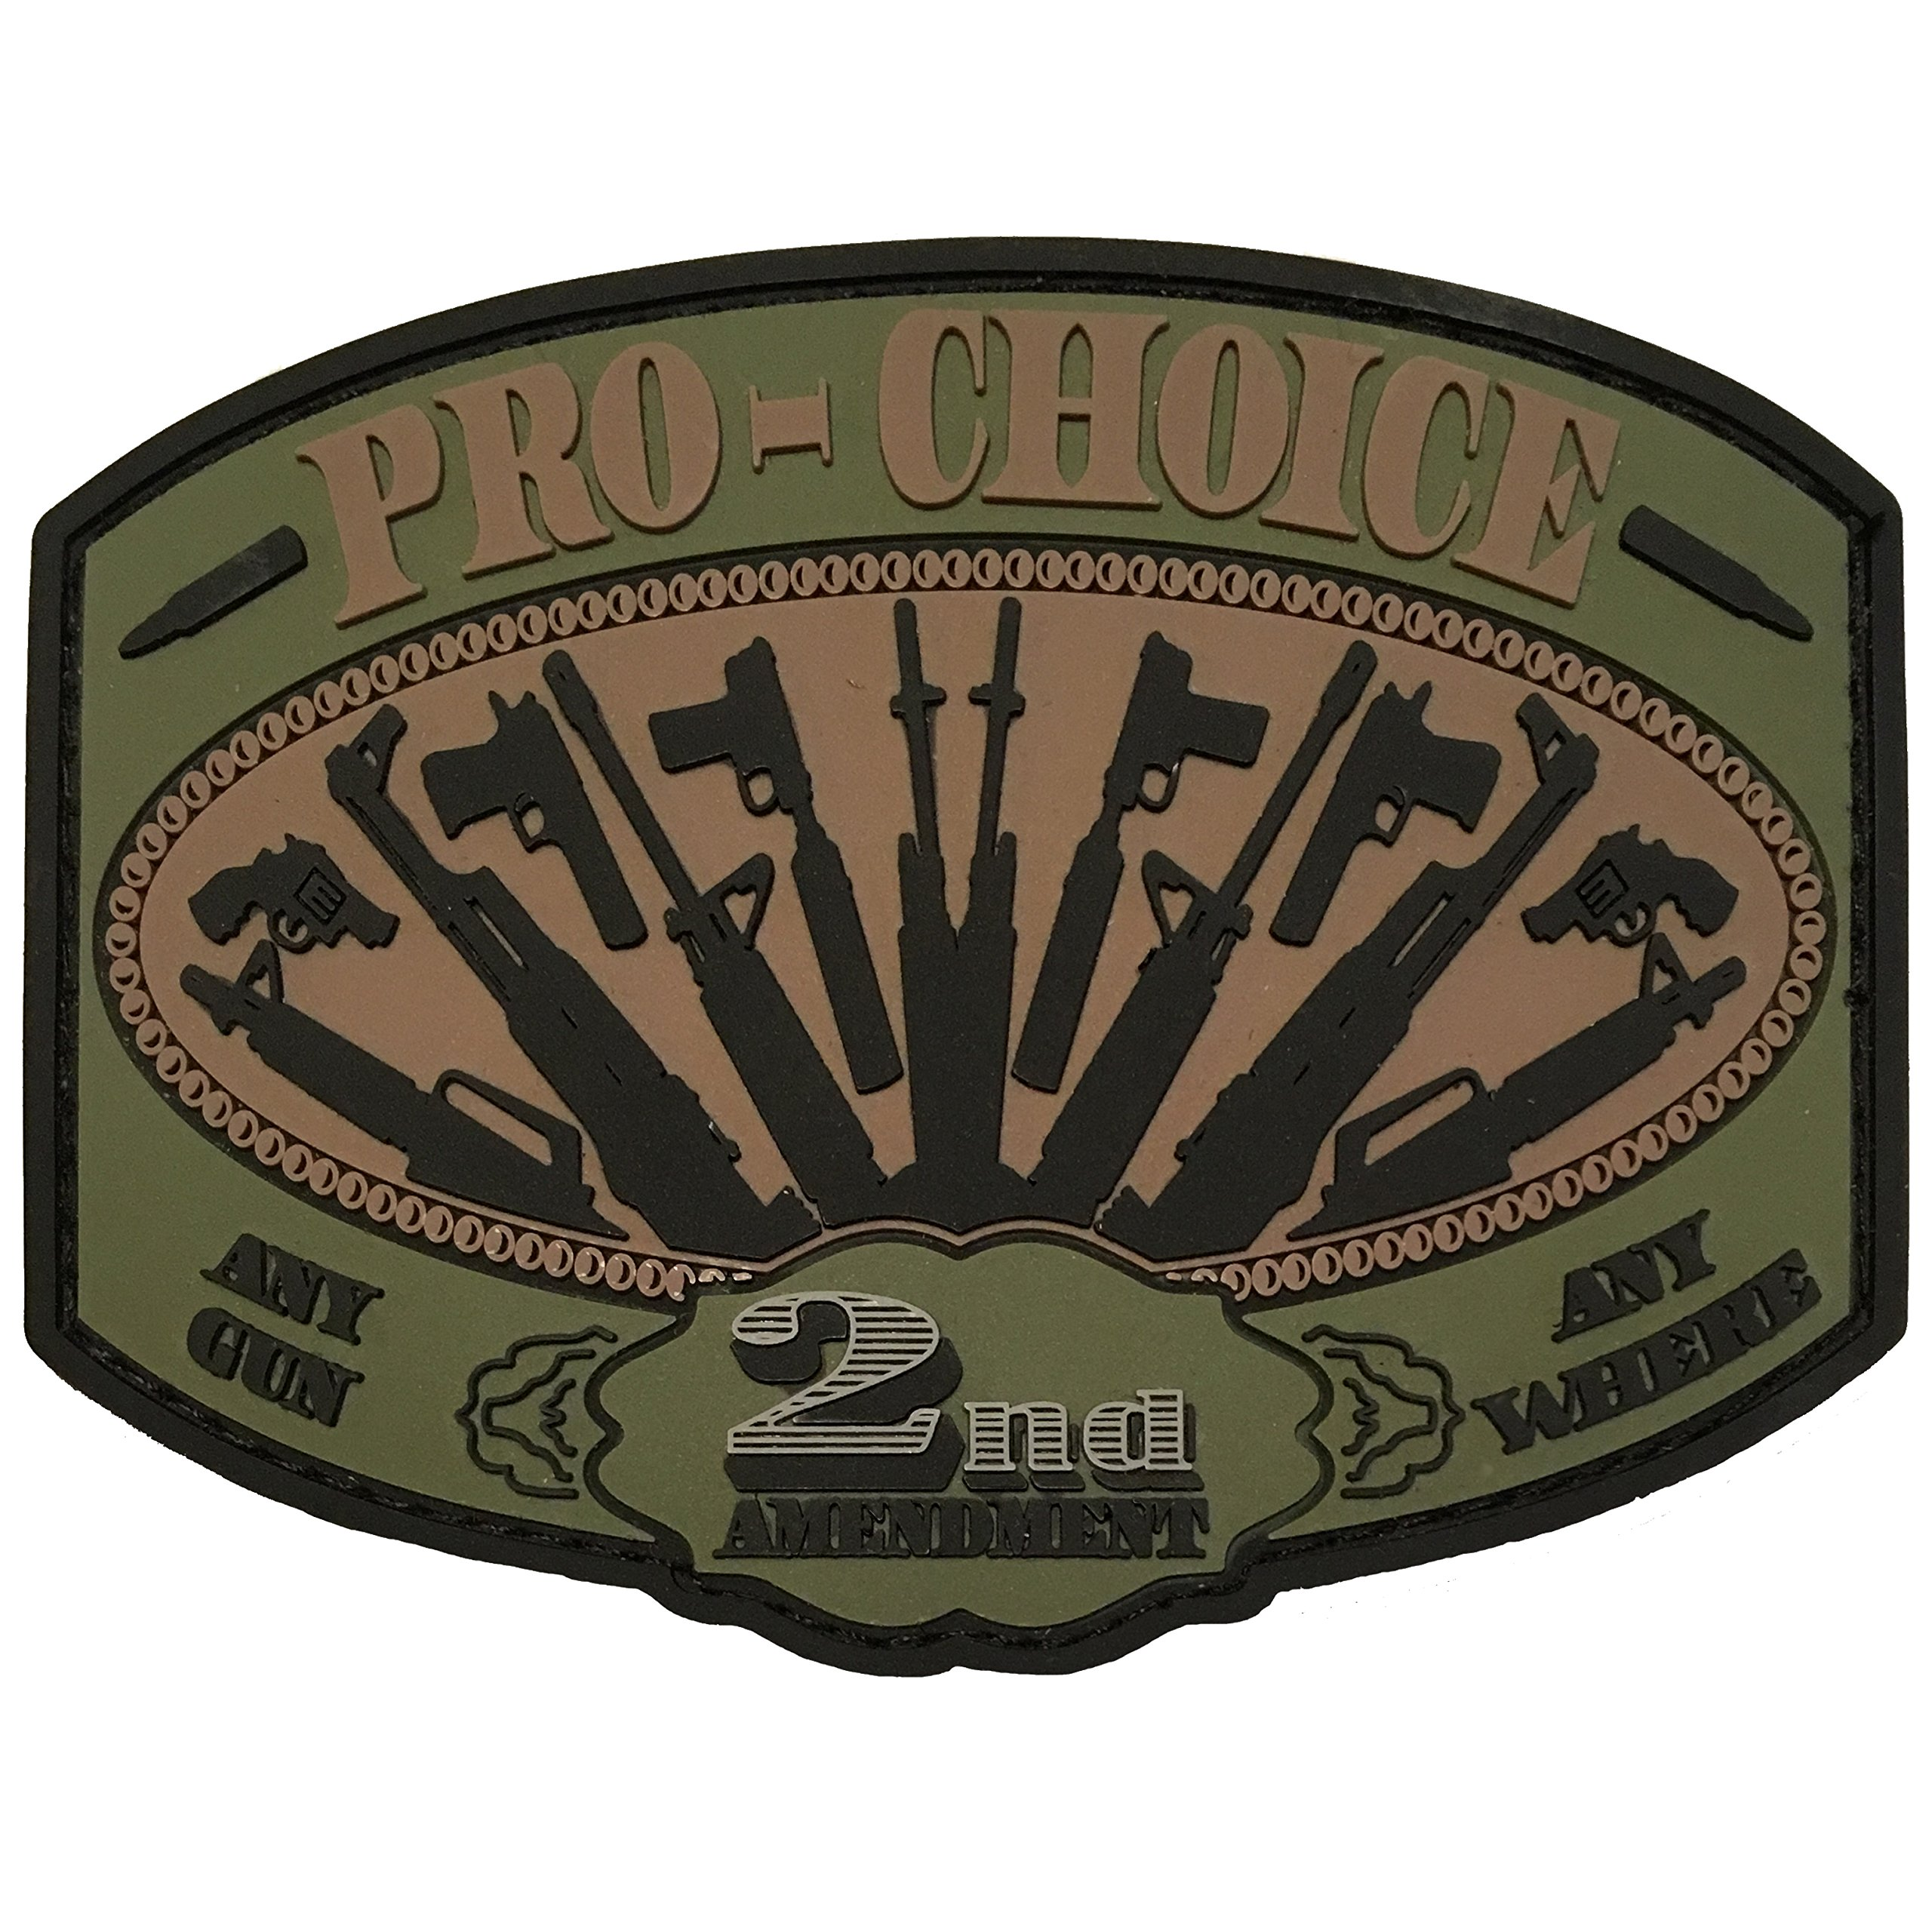 Pro Choice - 2nd Amendment - PVC Morale Patch